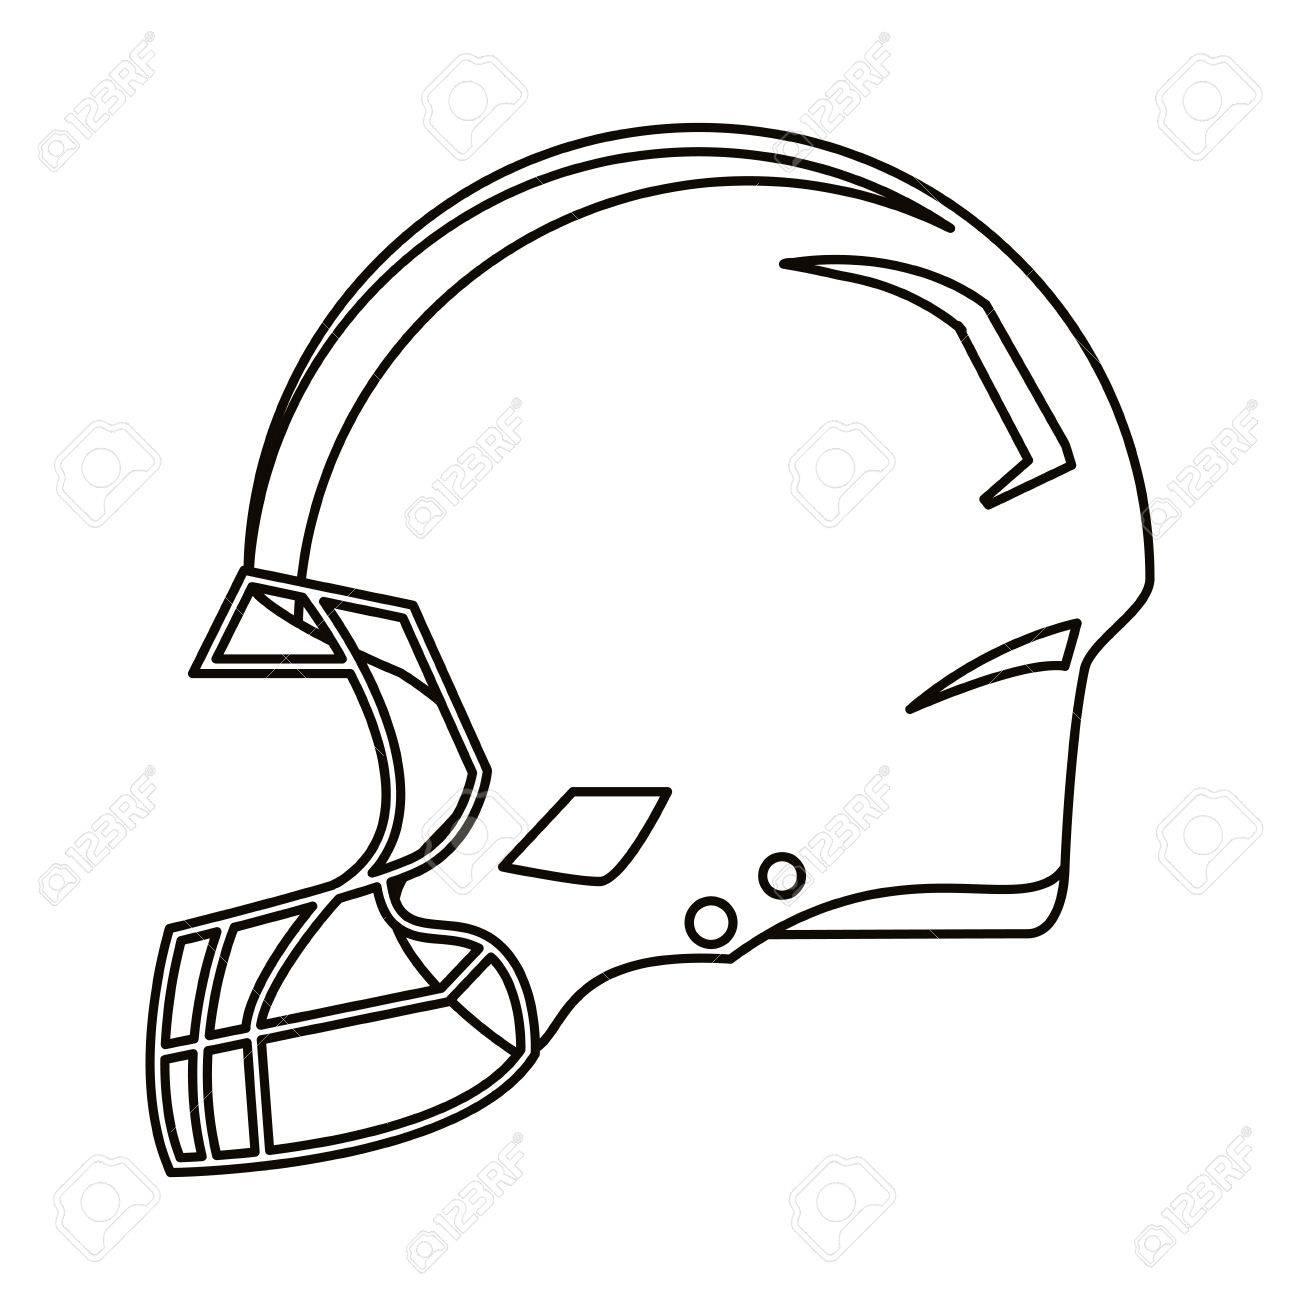 1300x1300 American Football Helmet Protection Outline Vector Illustration